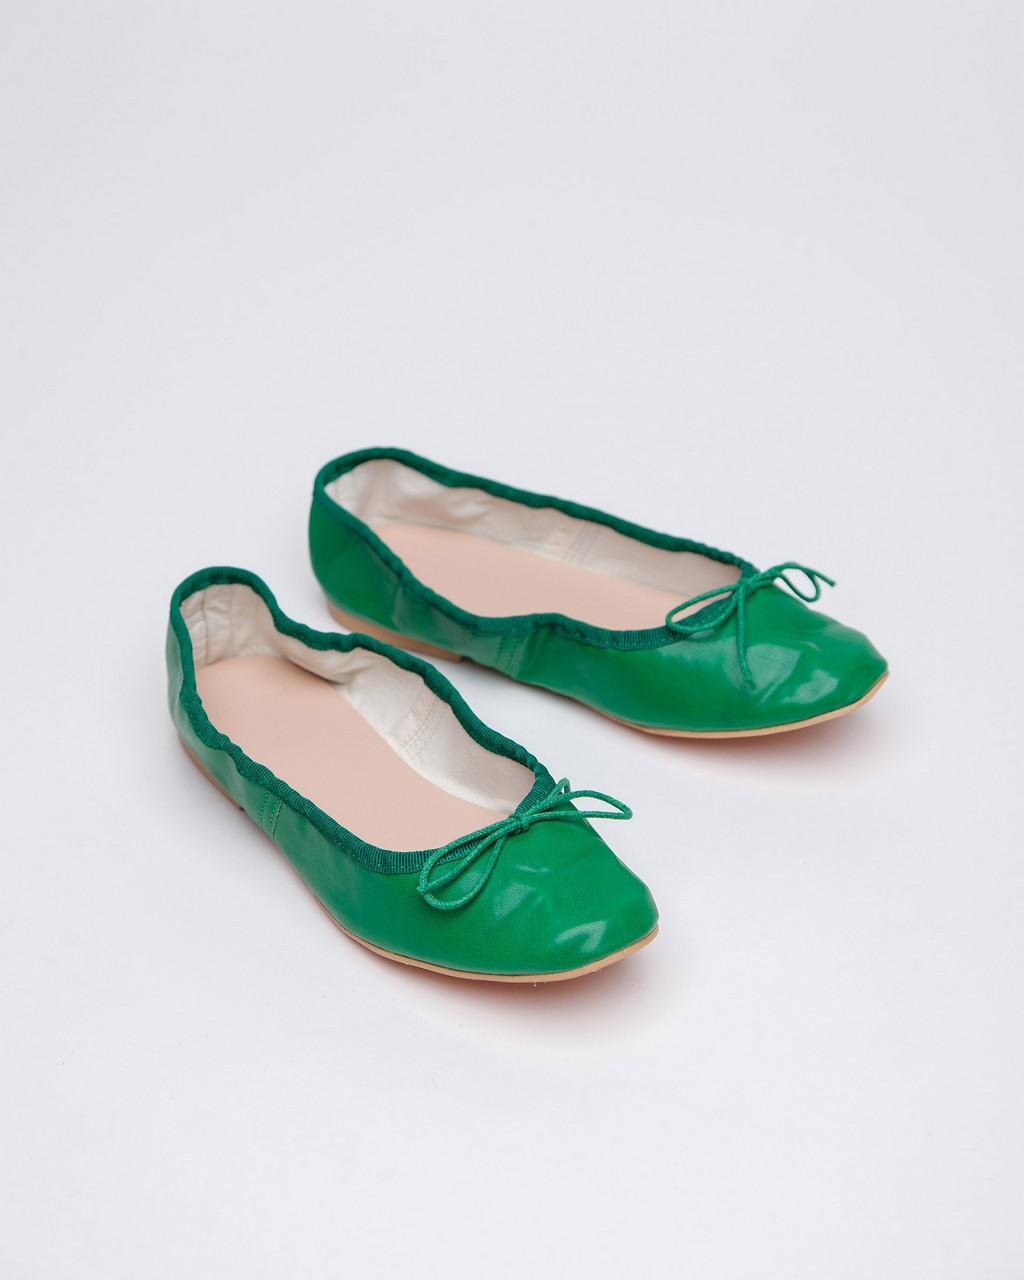 Tagtraume E.Ballerina - New Green(뉴 그린)